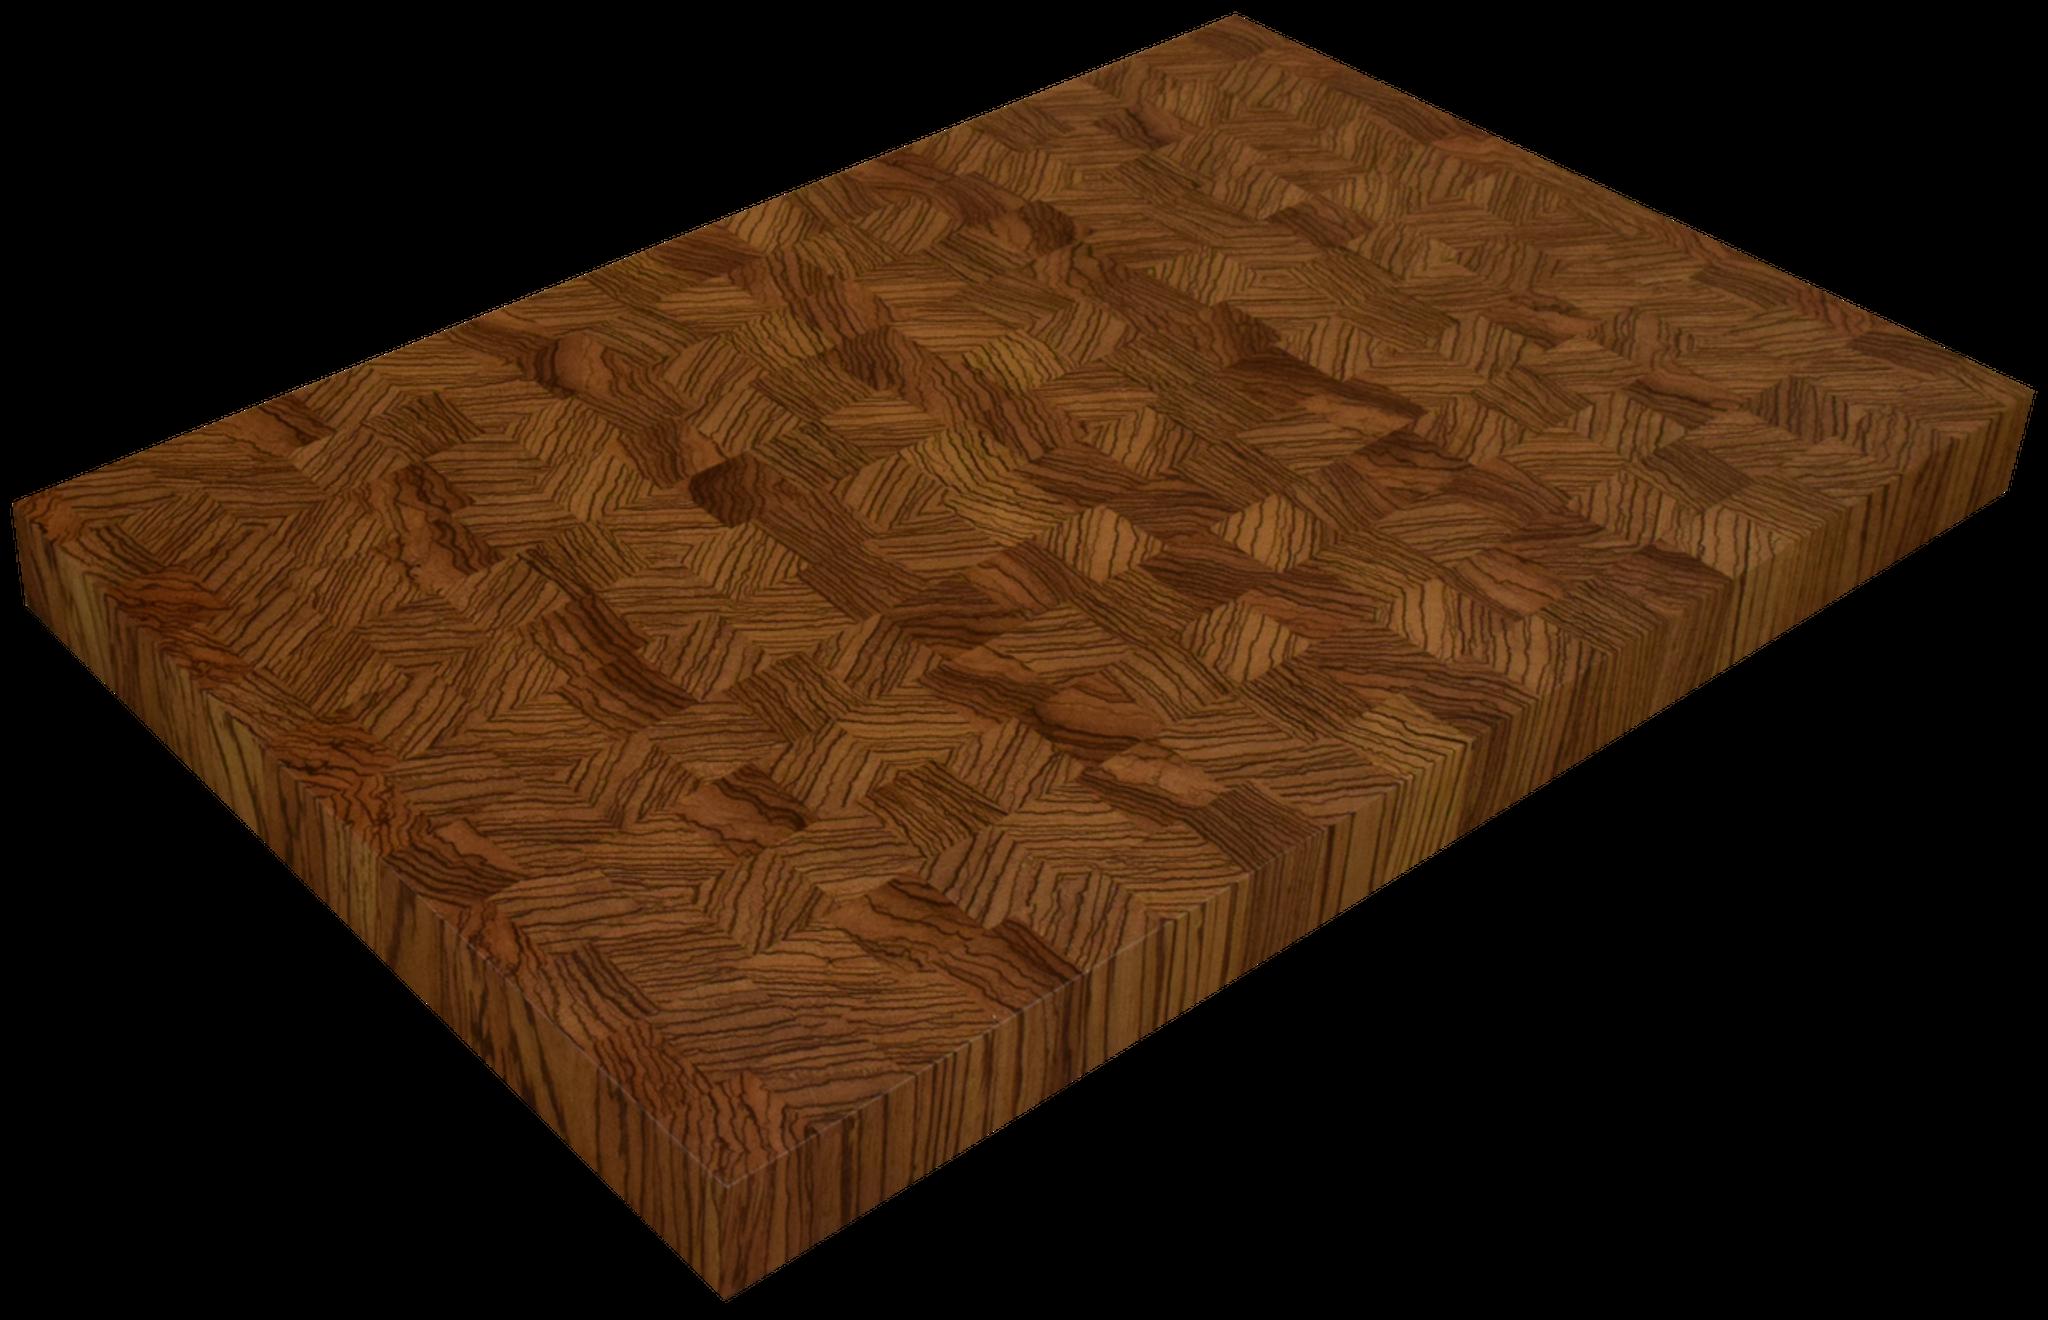 zebrawood end grain butcher block countertop hardwood lumber company. Black Bedroom Furniture Sets. Home Design Ideas